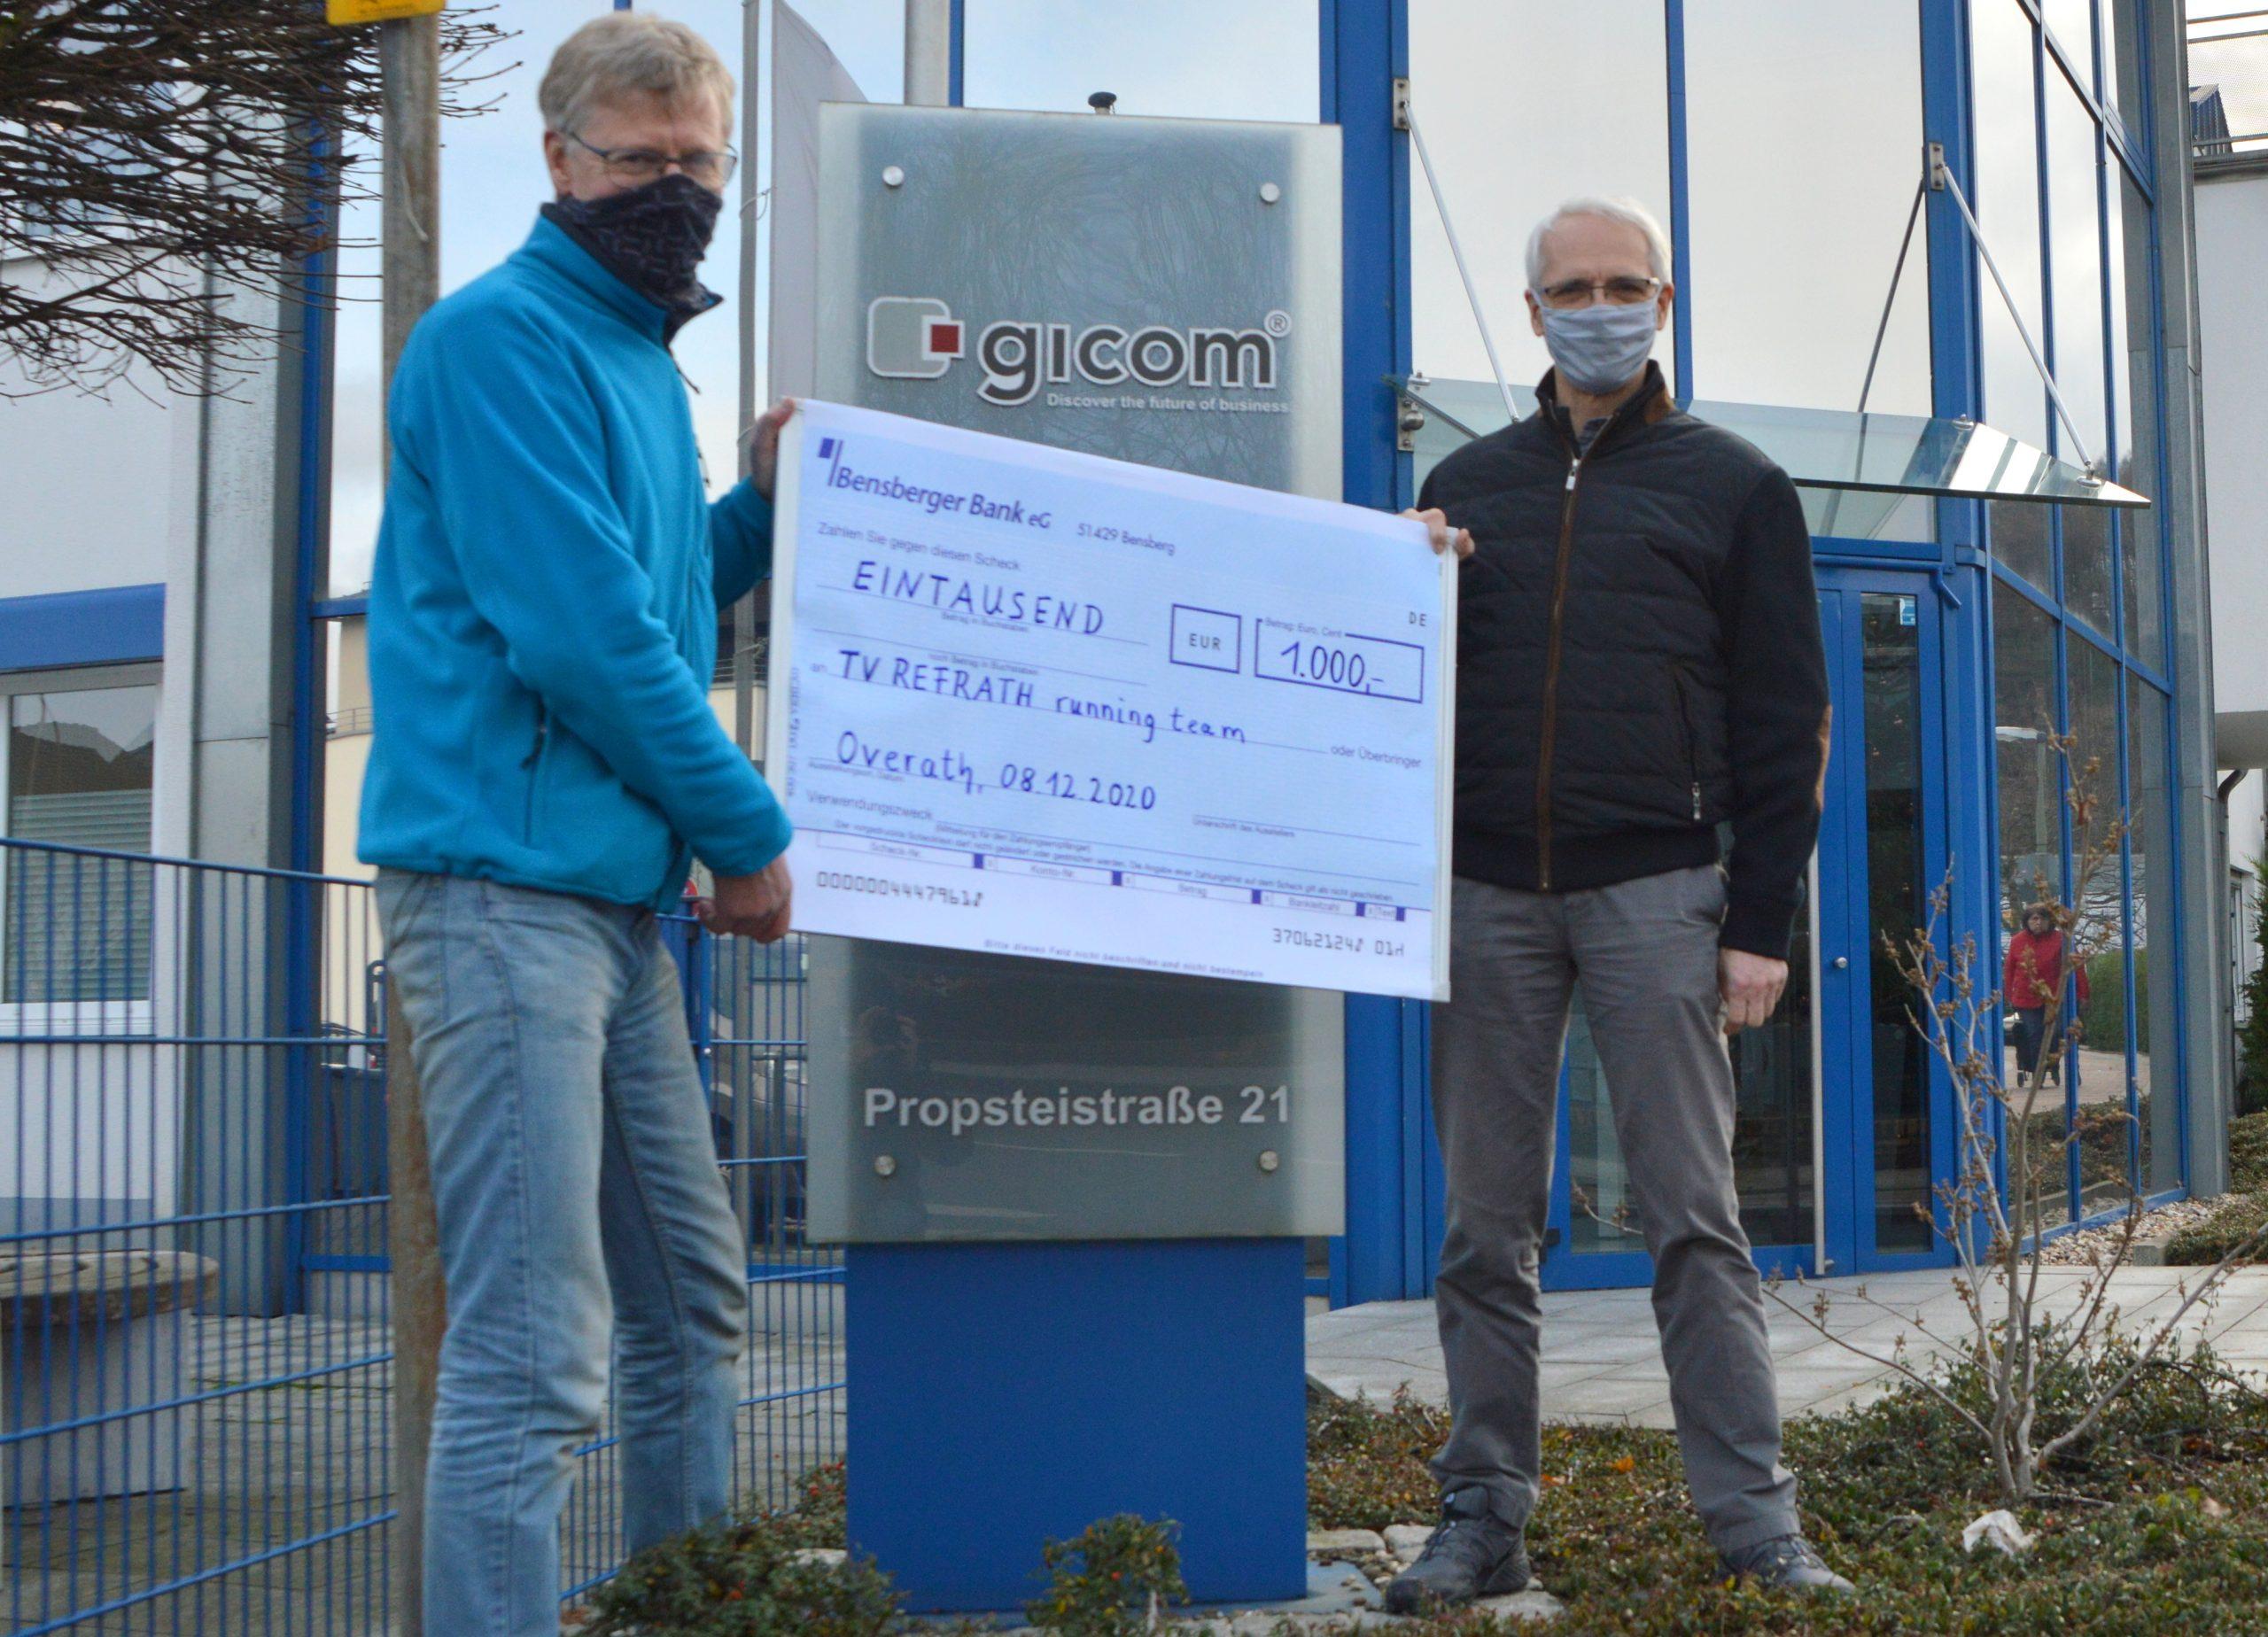 Königsforst Marathon 2020: gicom spendet 1.000€